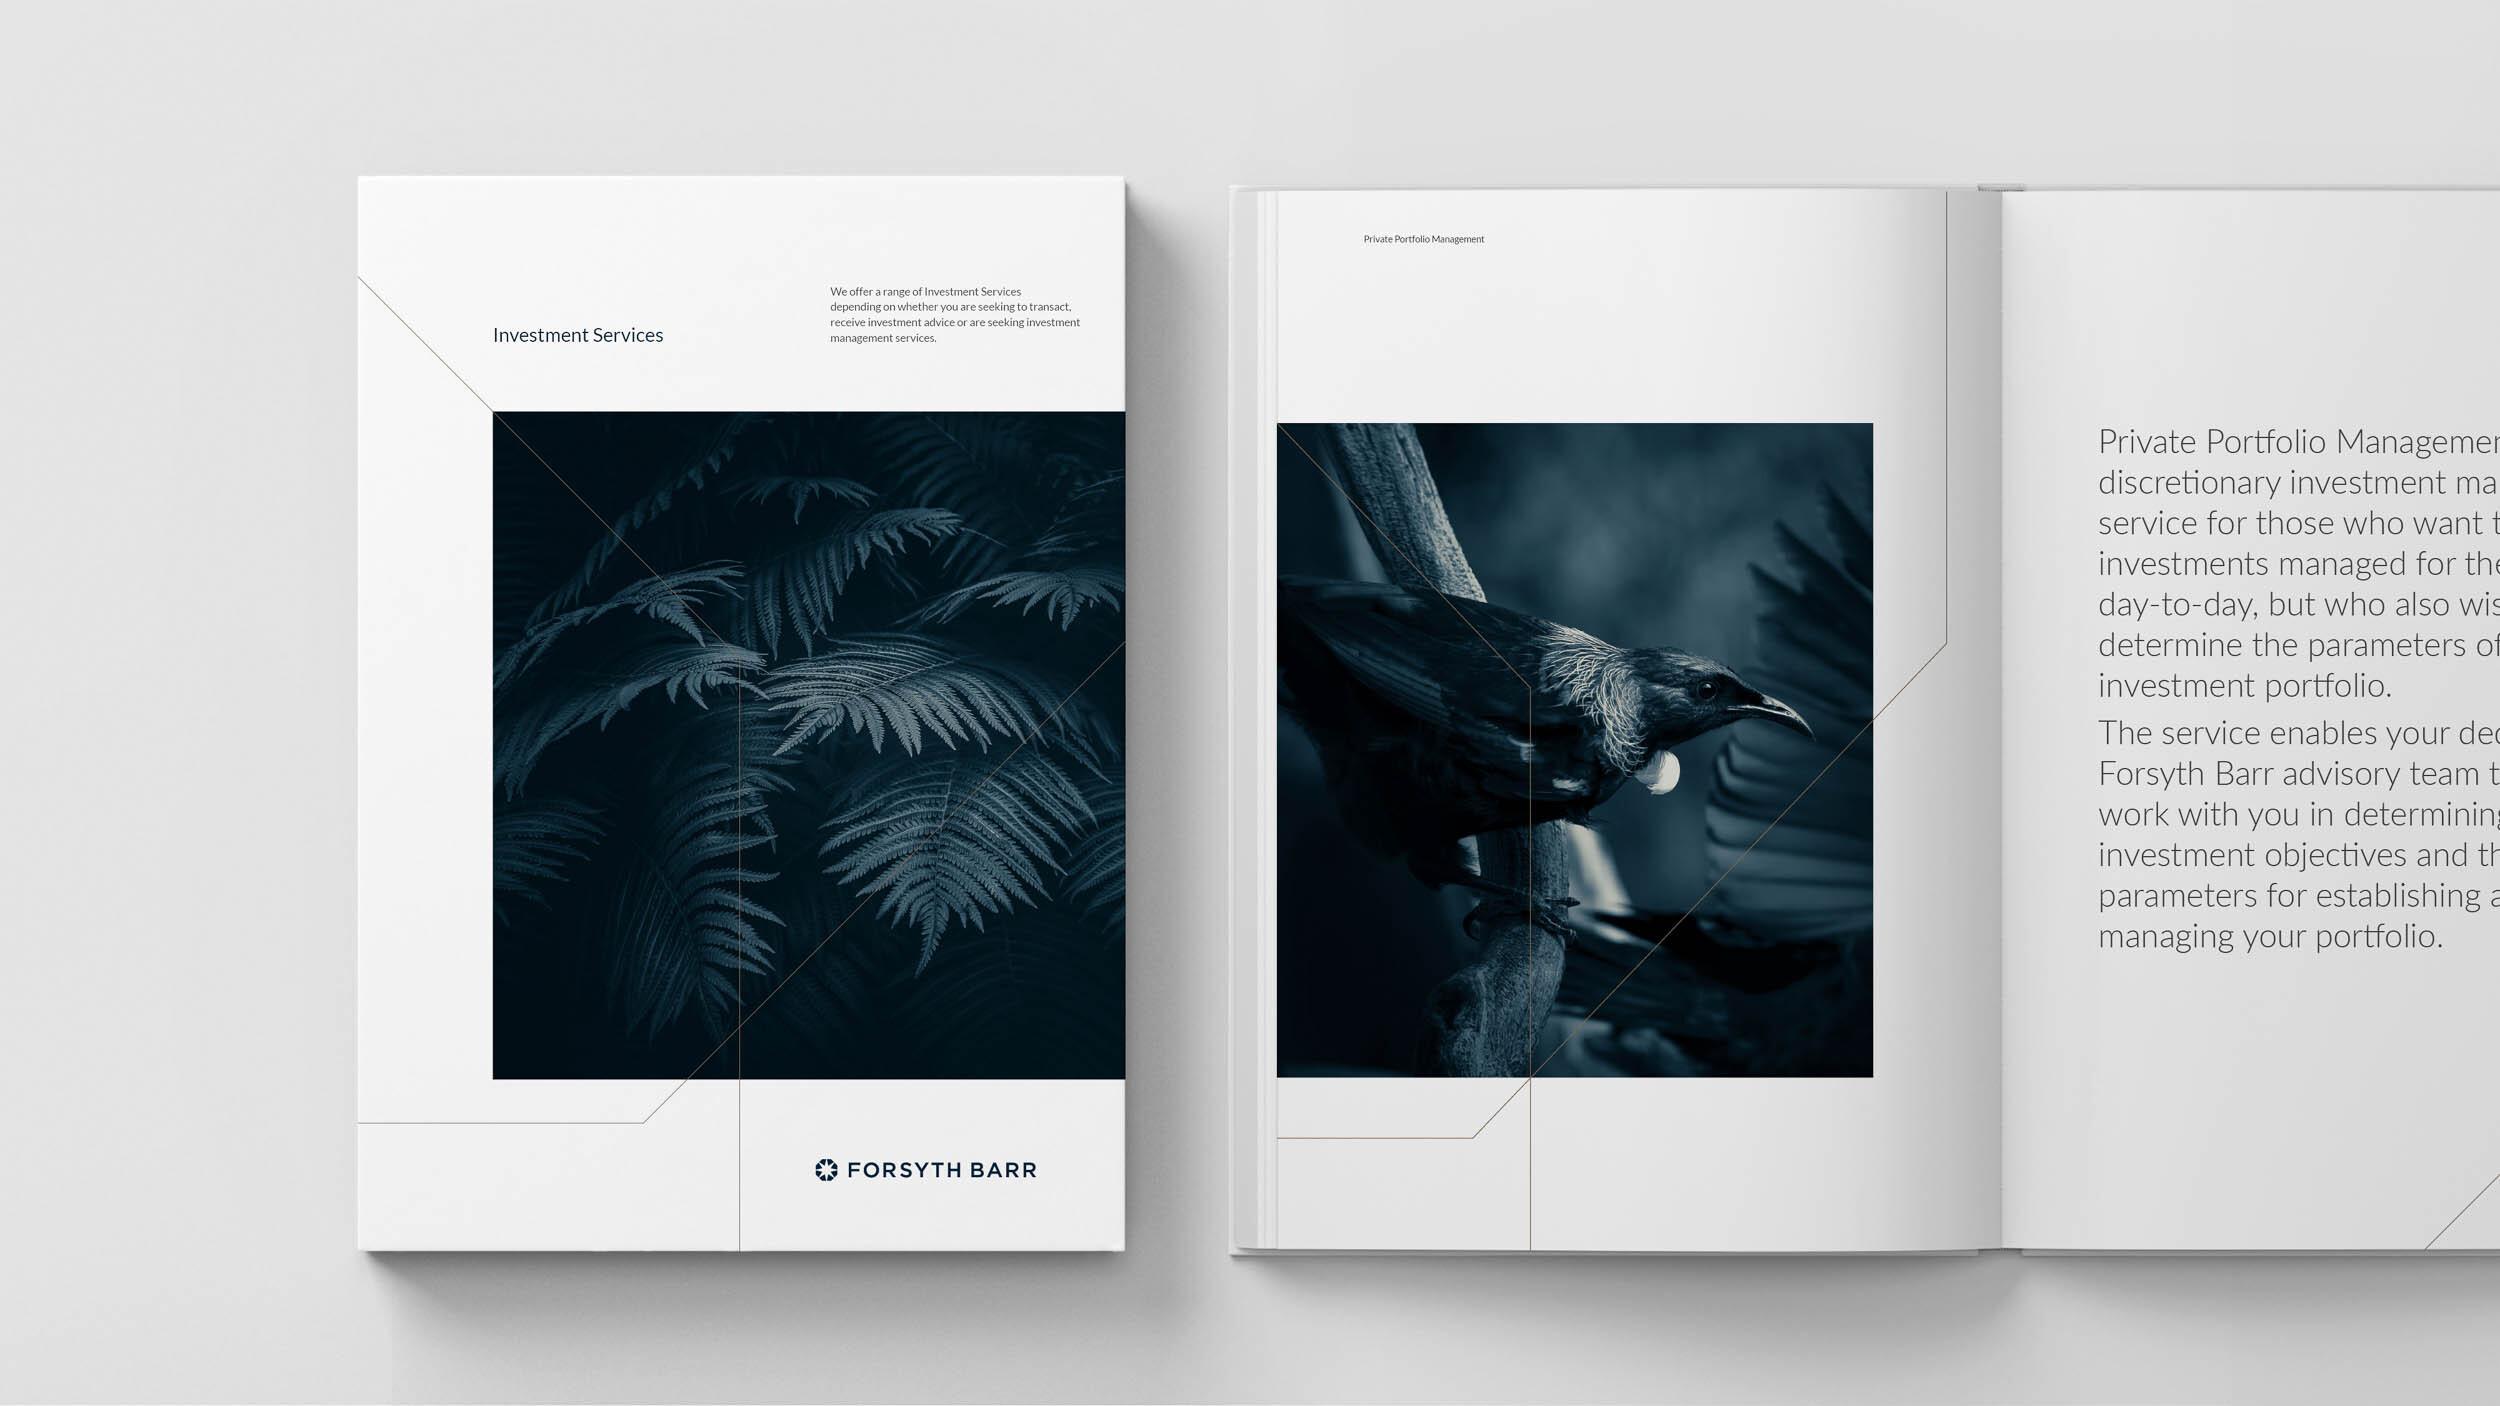 Forsyth Barr publication design photography